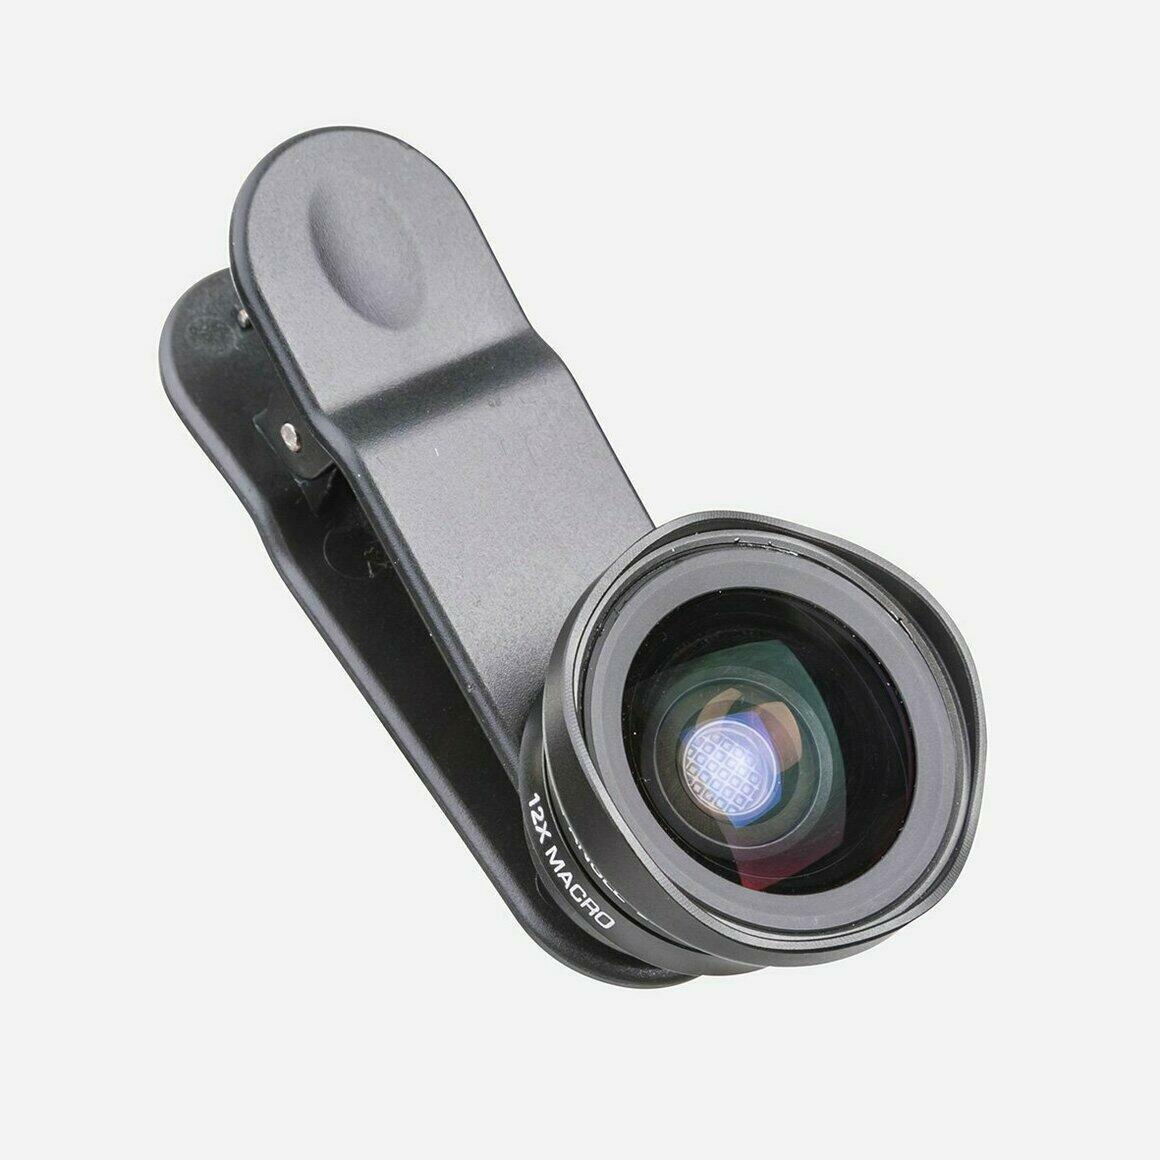 Pictar Smart Lens Wide Angle 16 MM / Macro Lens   Trada Marketplace